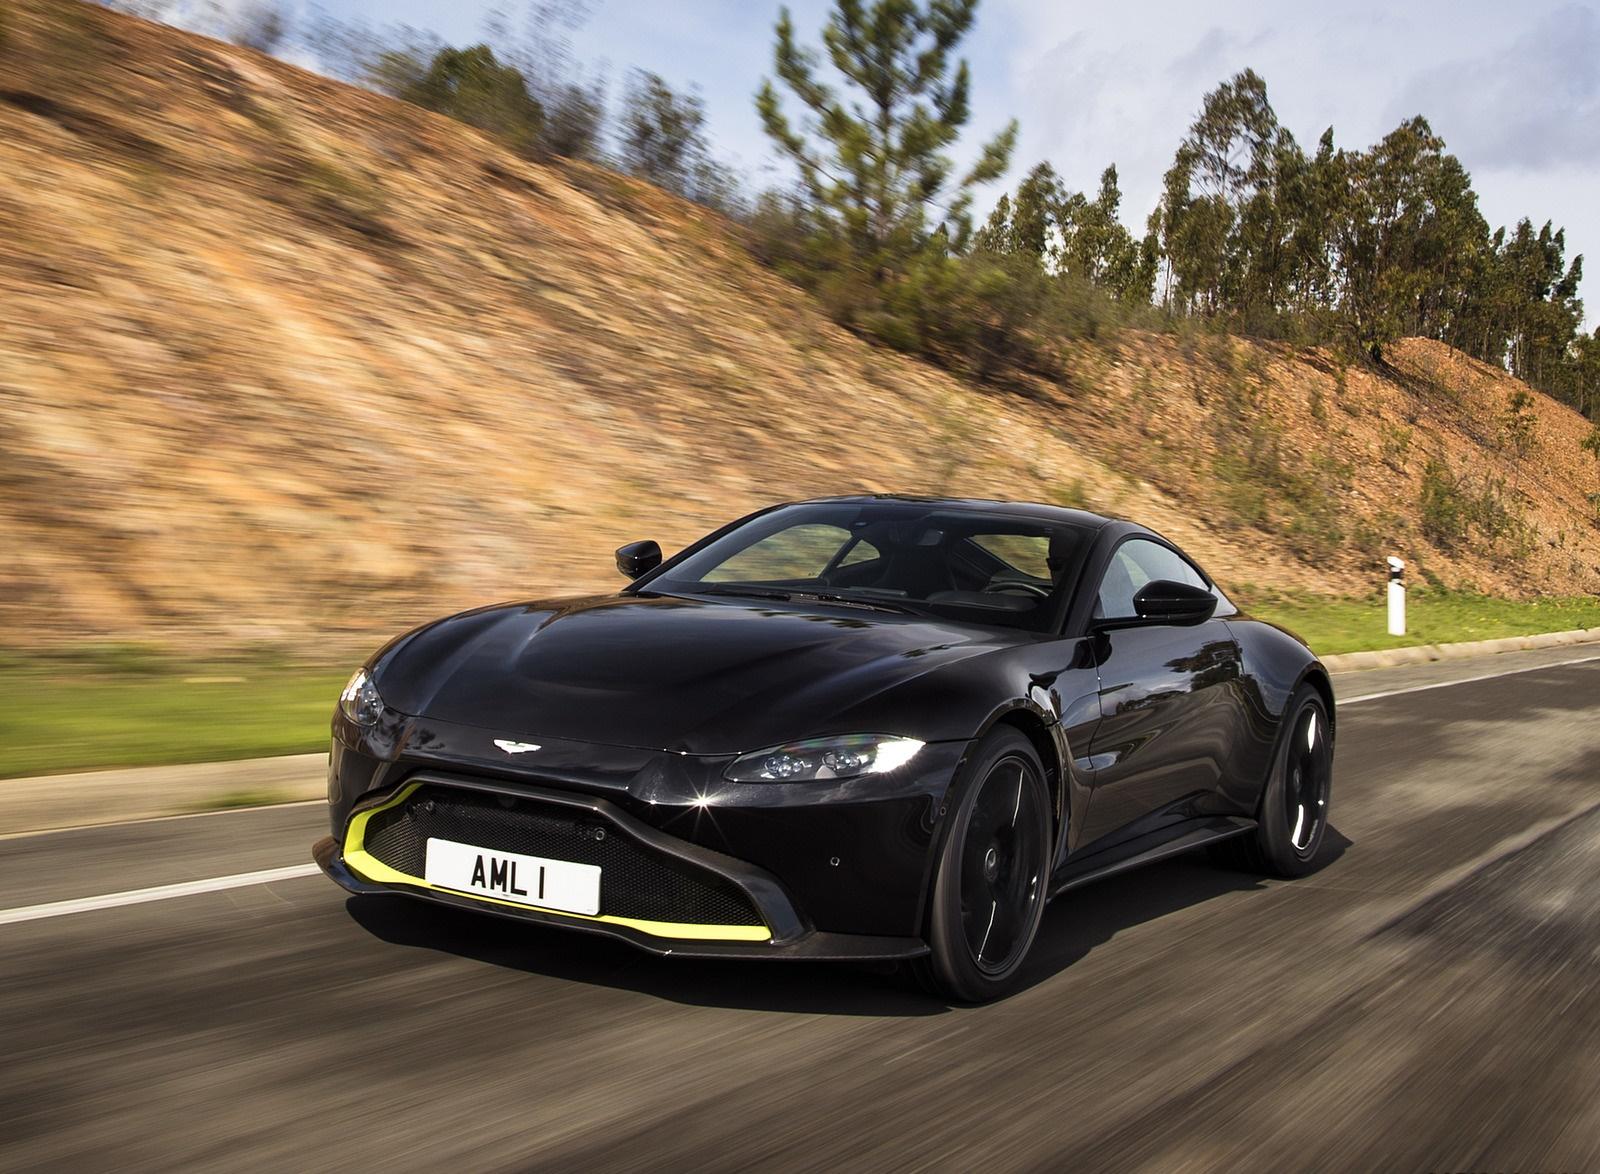 2019 Aston Martin Vantage (Onyx Black) Front Three-Quarter Wallpapers (7)